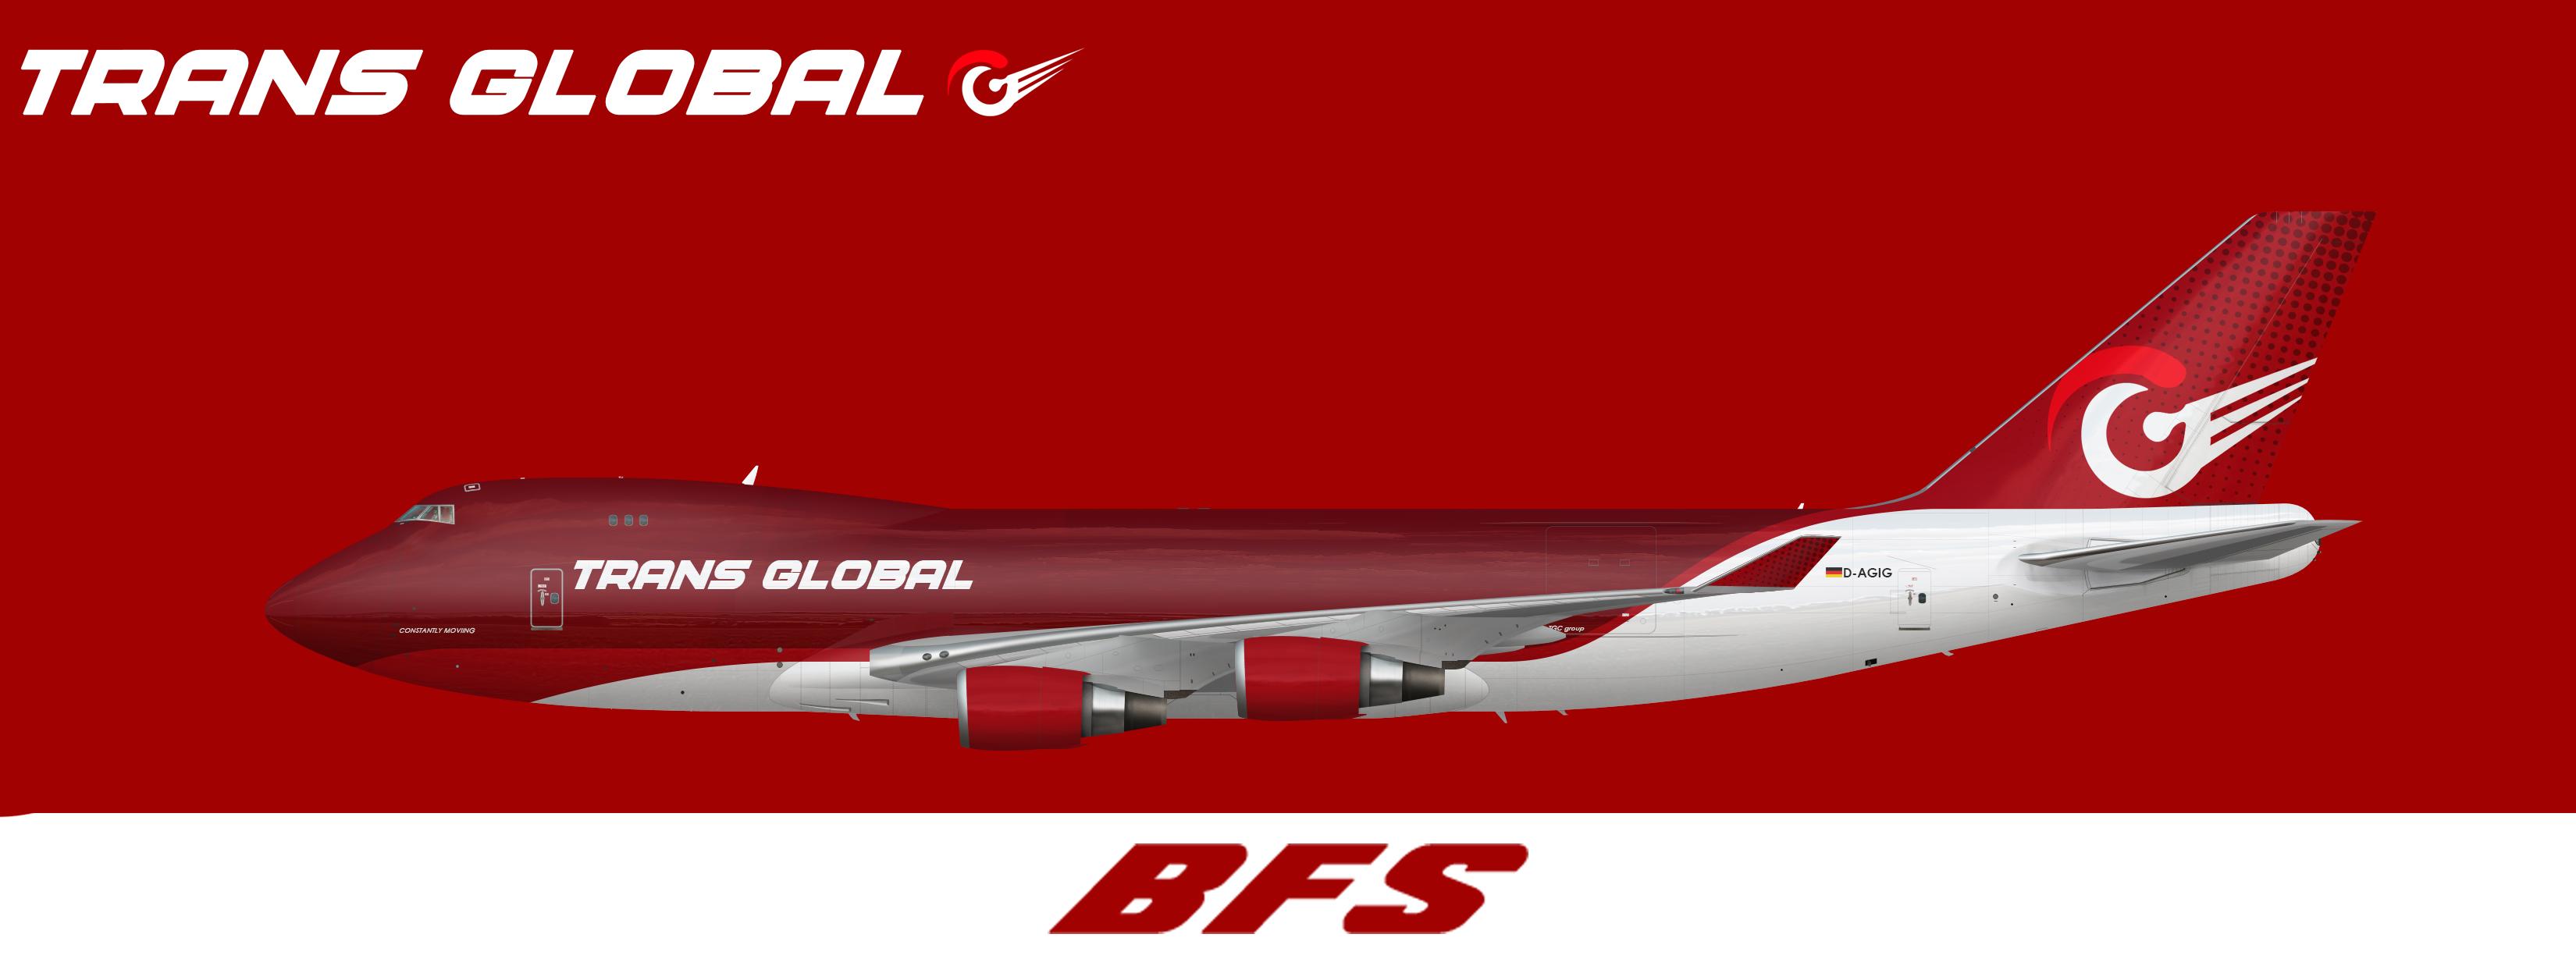 TGC_Boeing_747-400F_copy.png